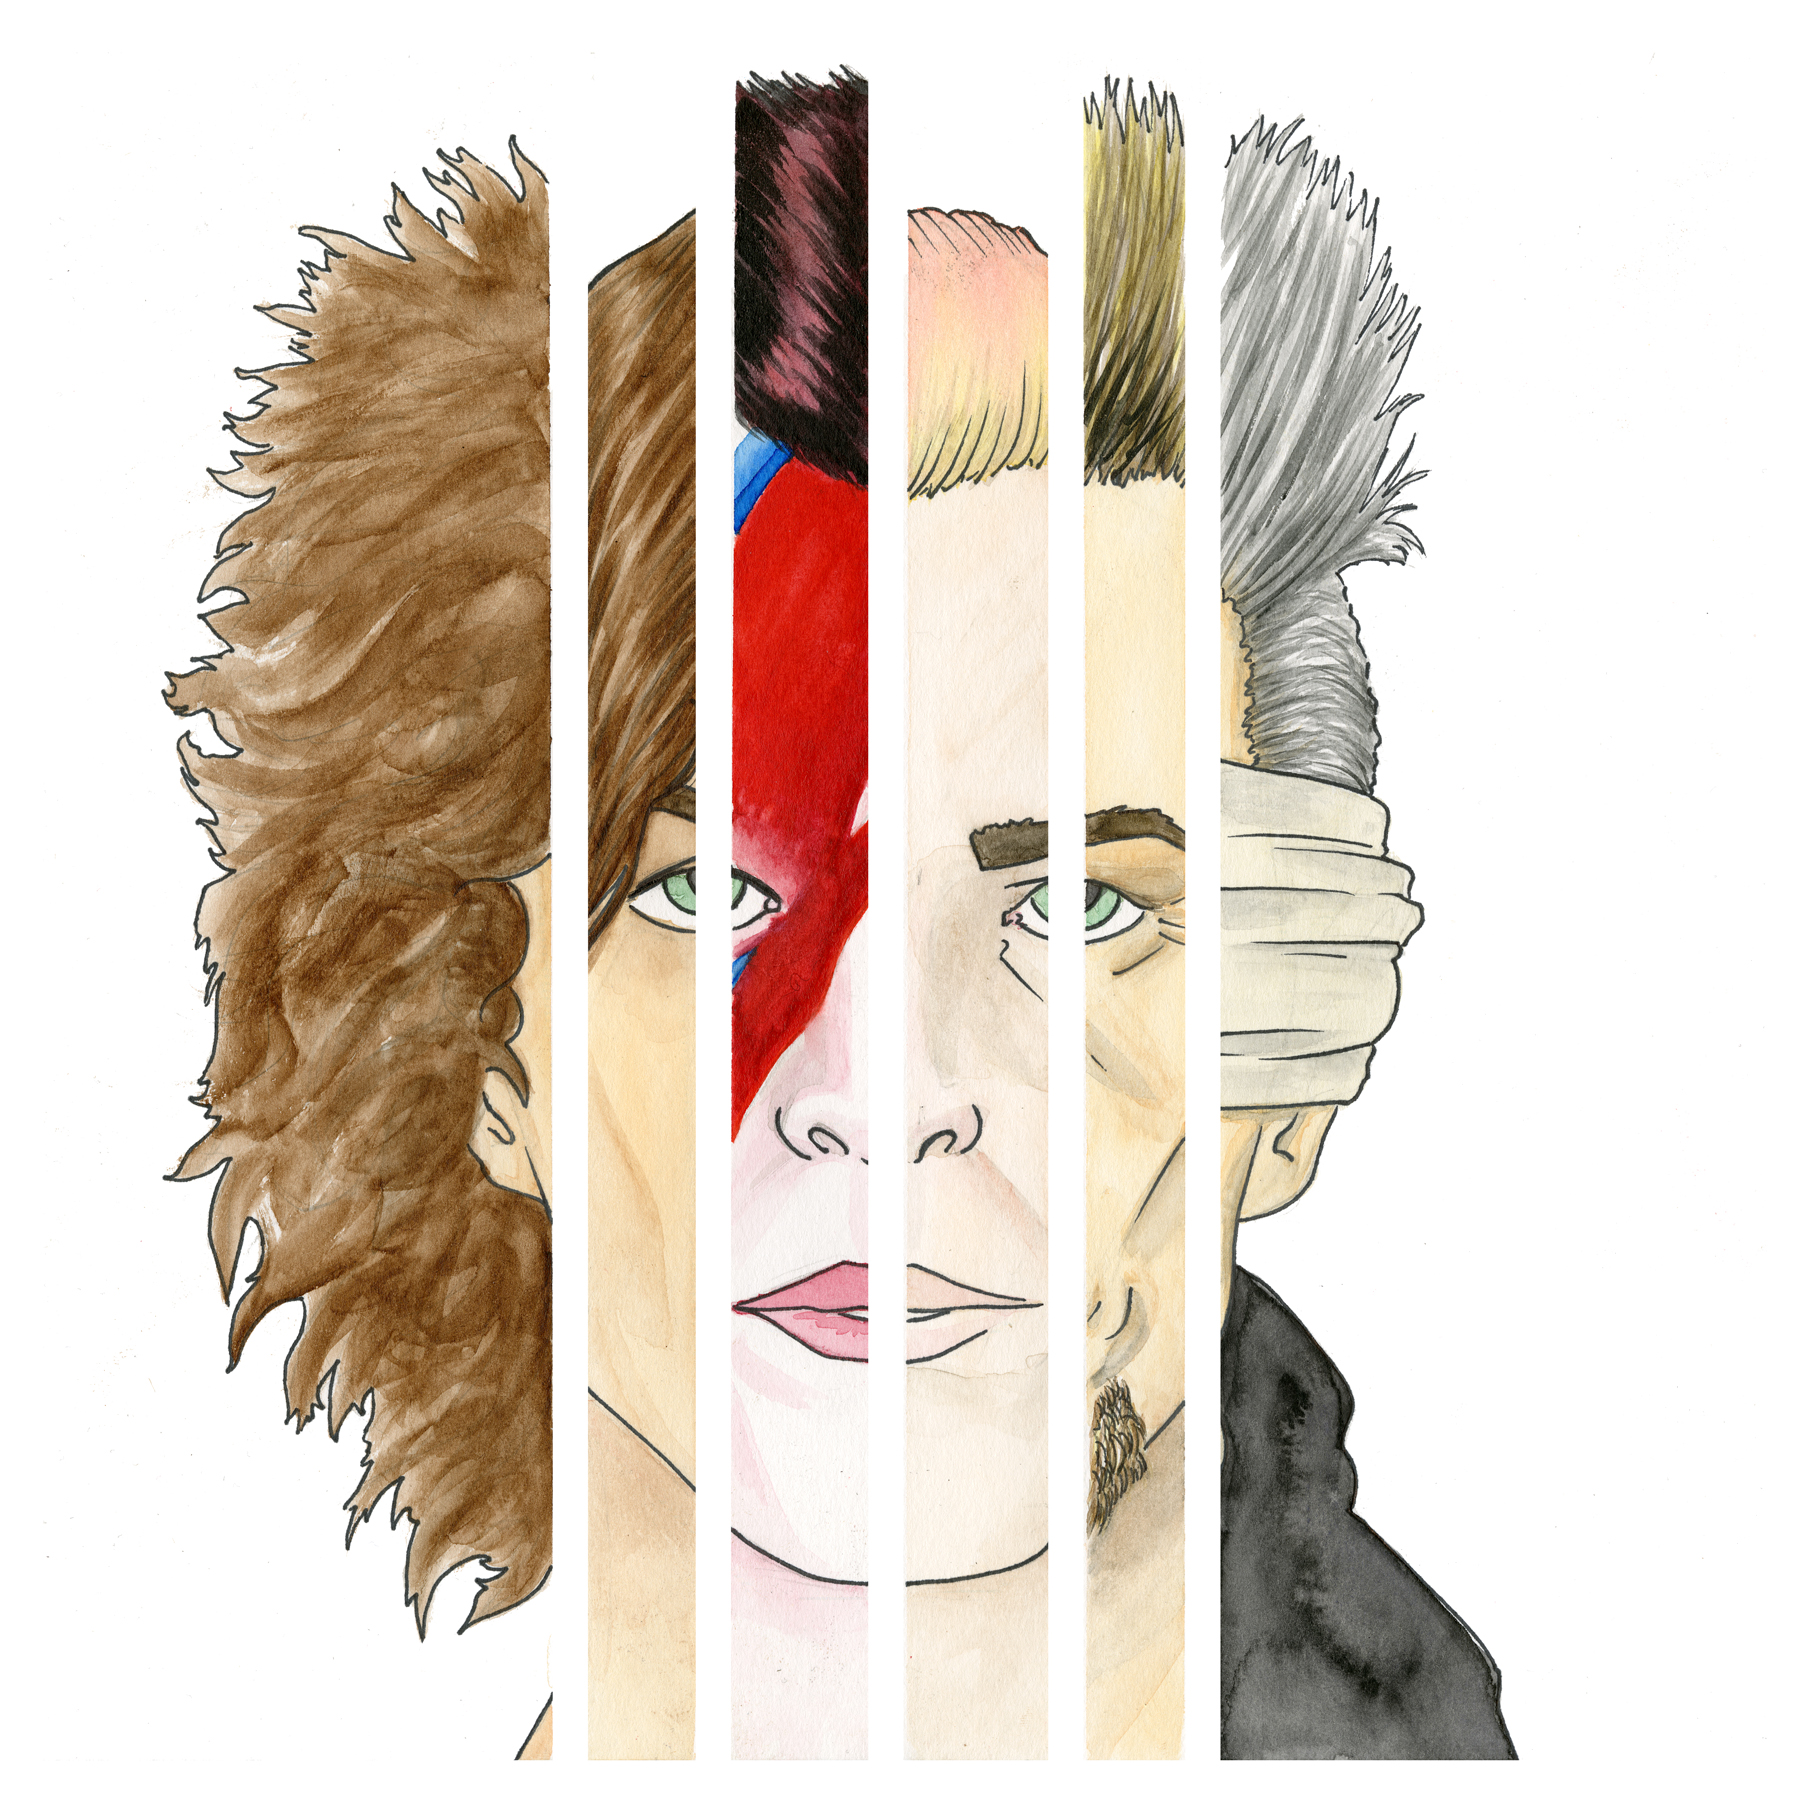 Bowie+12x12+150.jpg